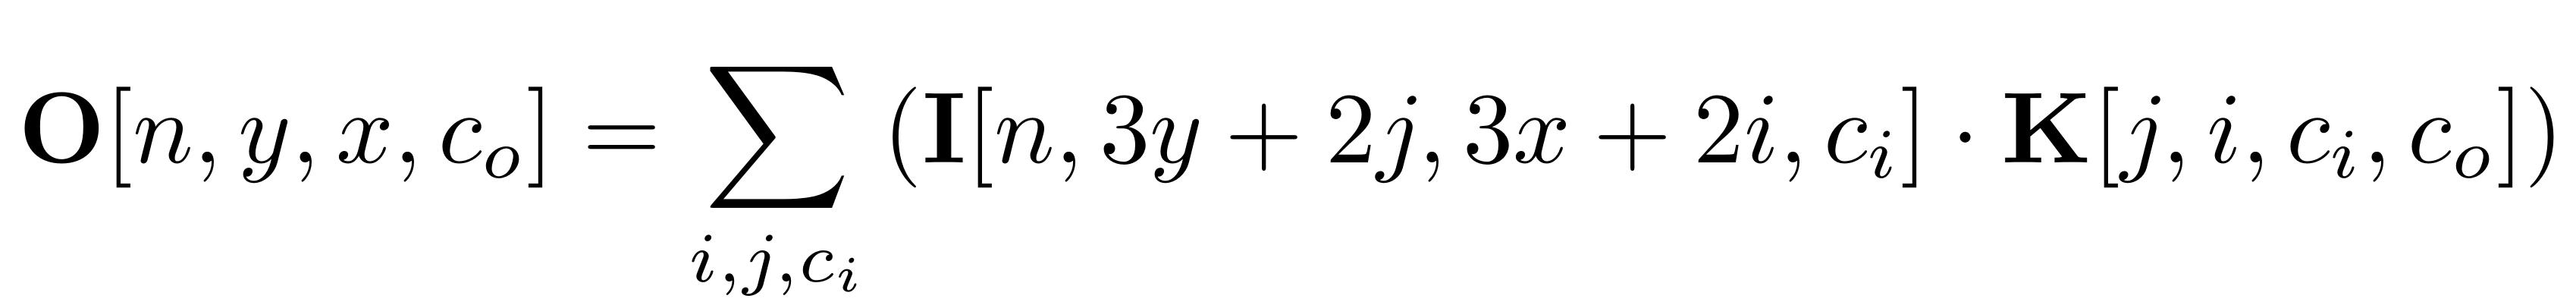 The convolution formula O[n, y, x, c_o] = sum_{i, j, c_i} (I[n, 3y + 2j, 3x + 2i, c_i] * K[j, i, c_i, c_o])